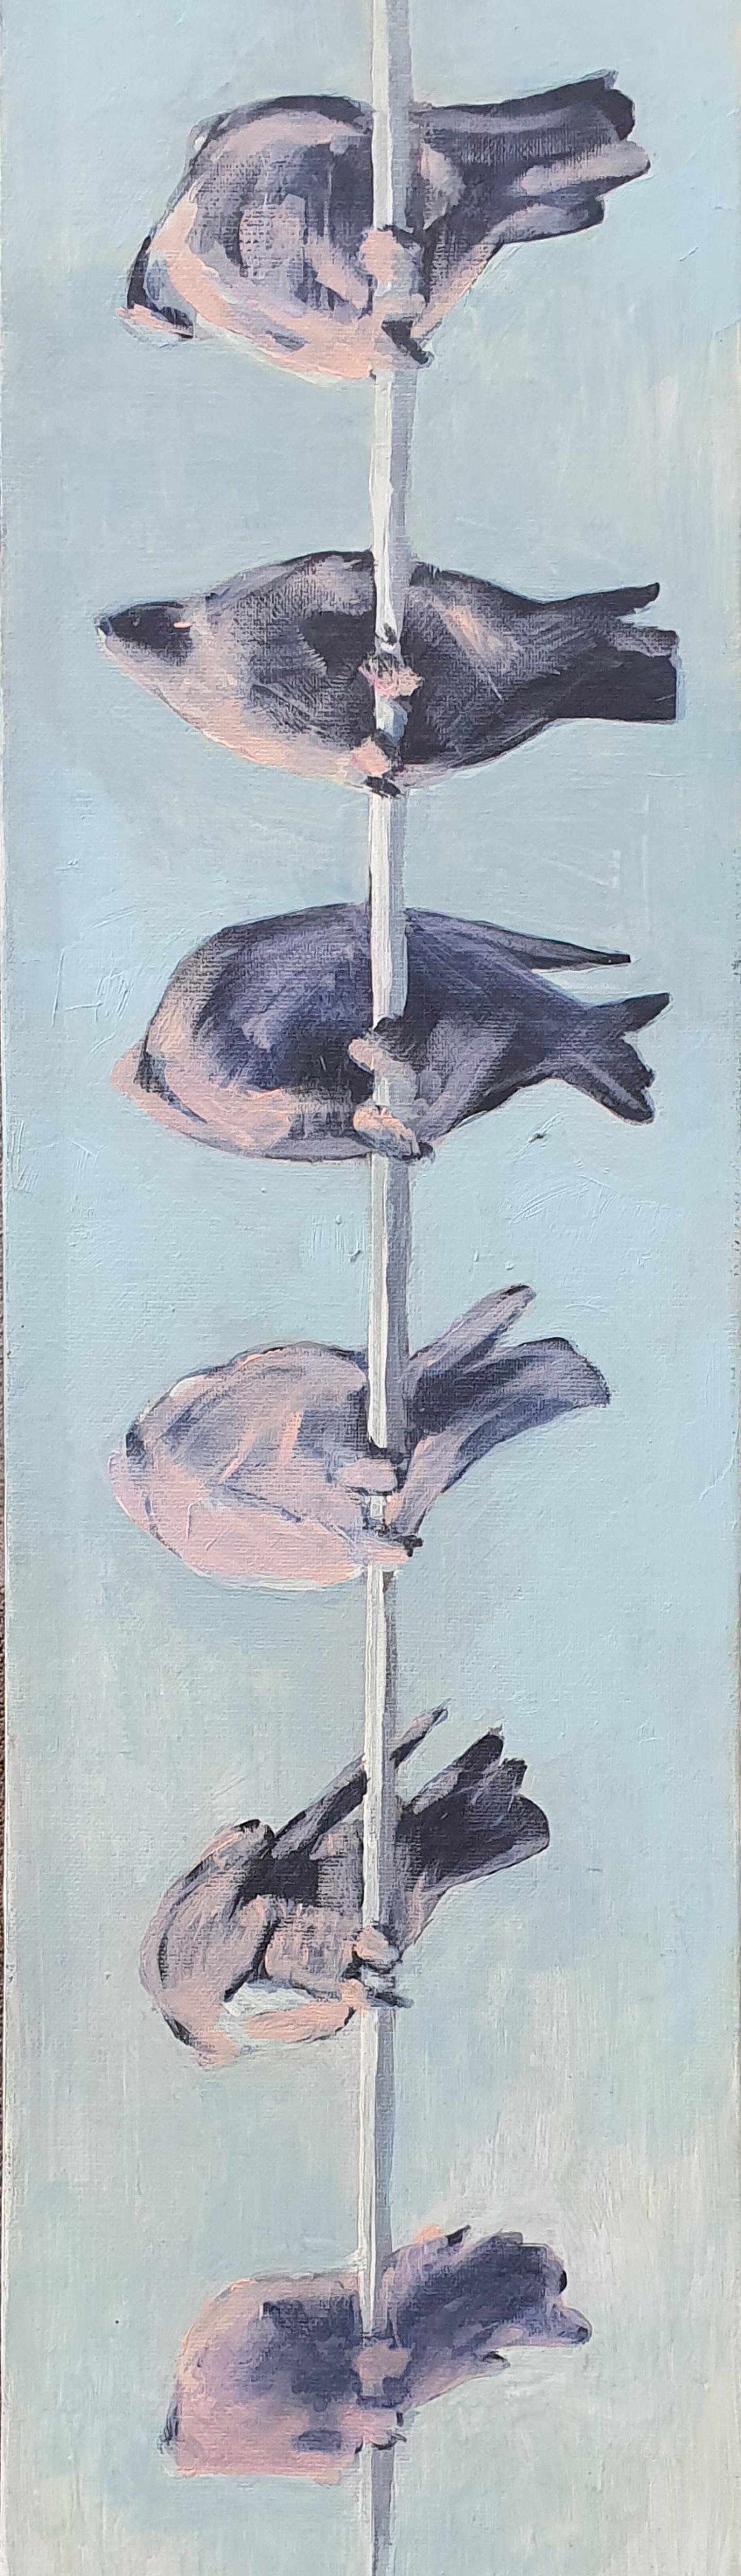 Birds - Contemporary, Blue, 21st Century, Figurative Painting